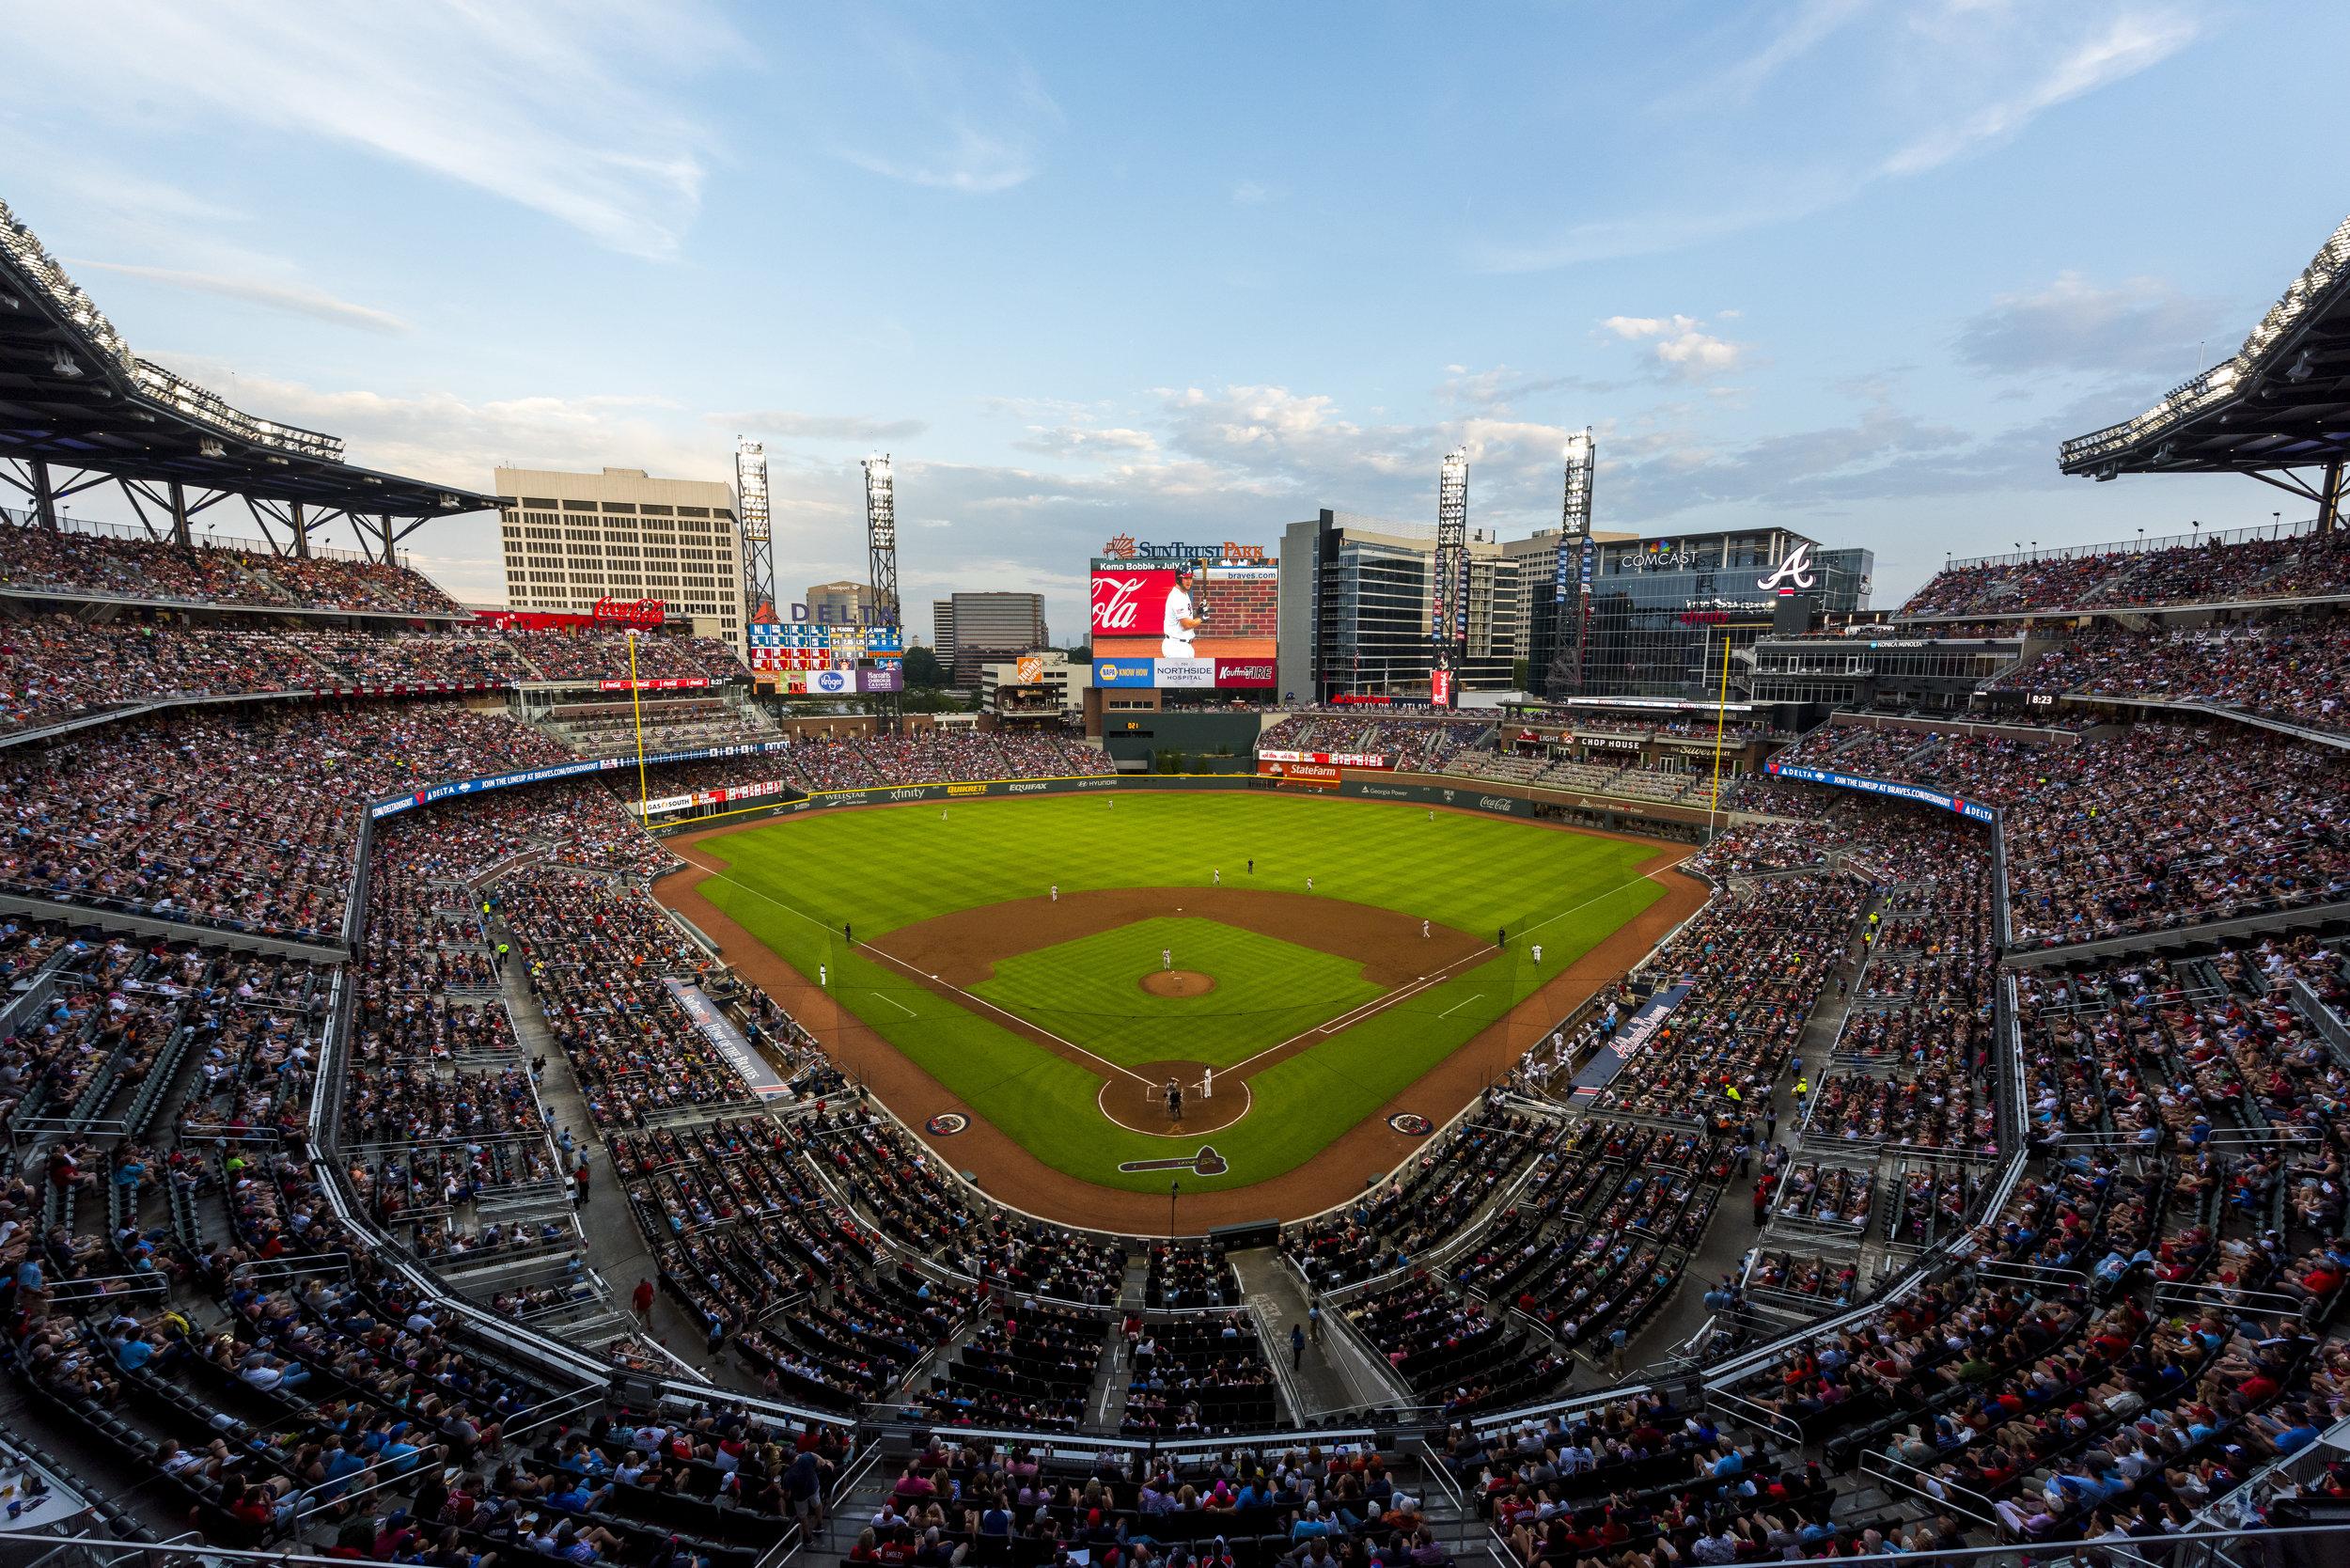 ATLANTA, GA - JULY 4: Overall of SunTrust park against the Houston Astros at SunTrust Park on July 4, 2017 in Atlanta, Georgia. The Astros won 16-4.